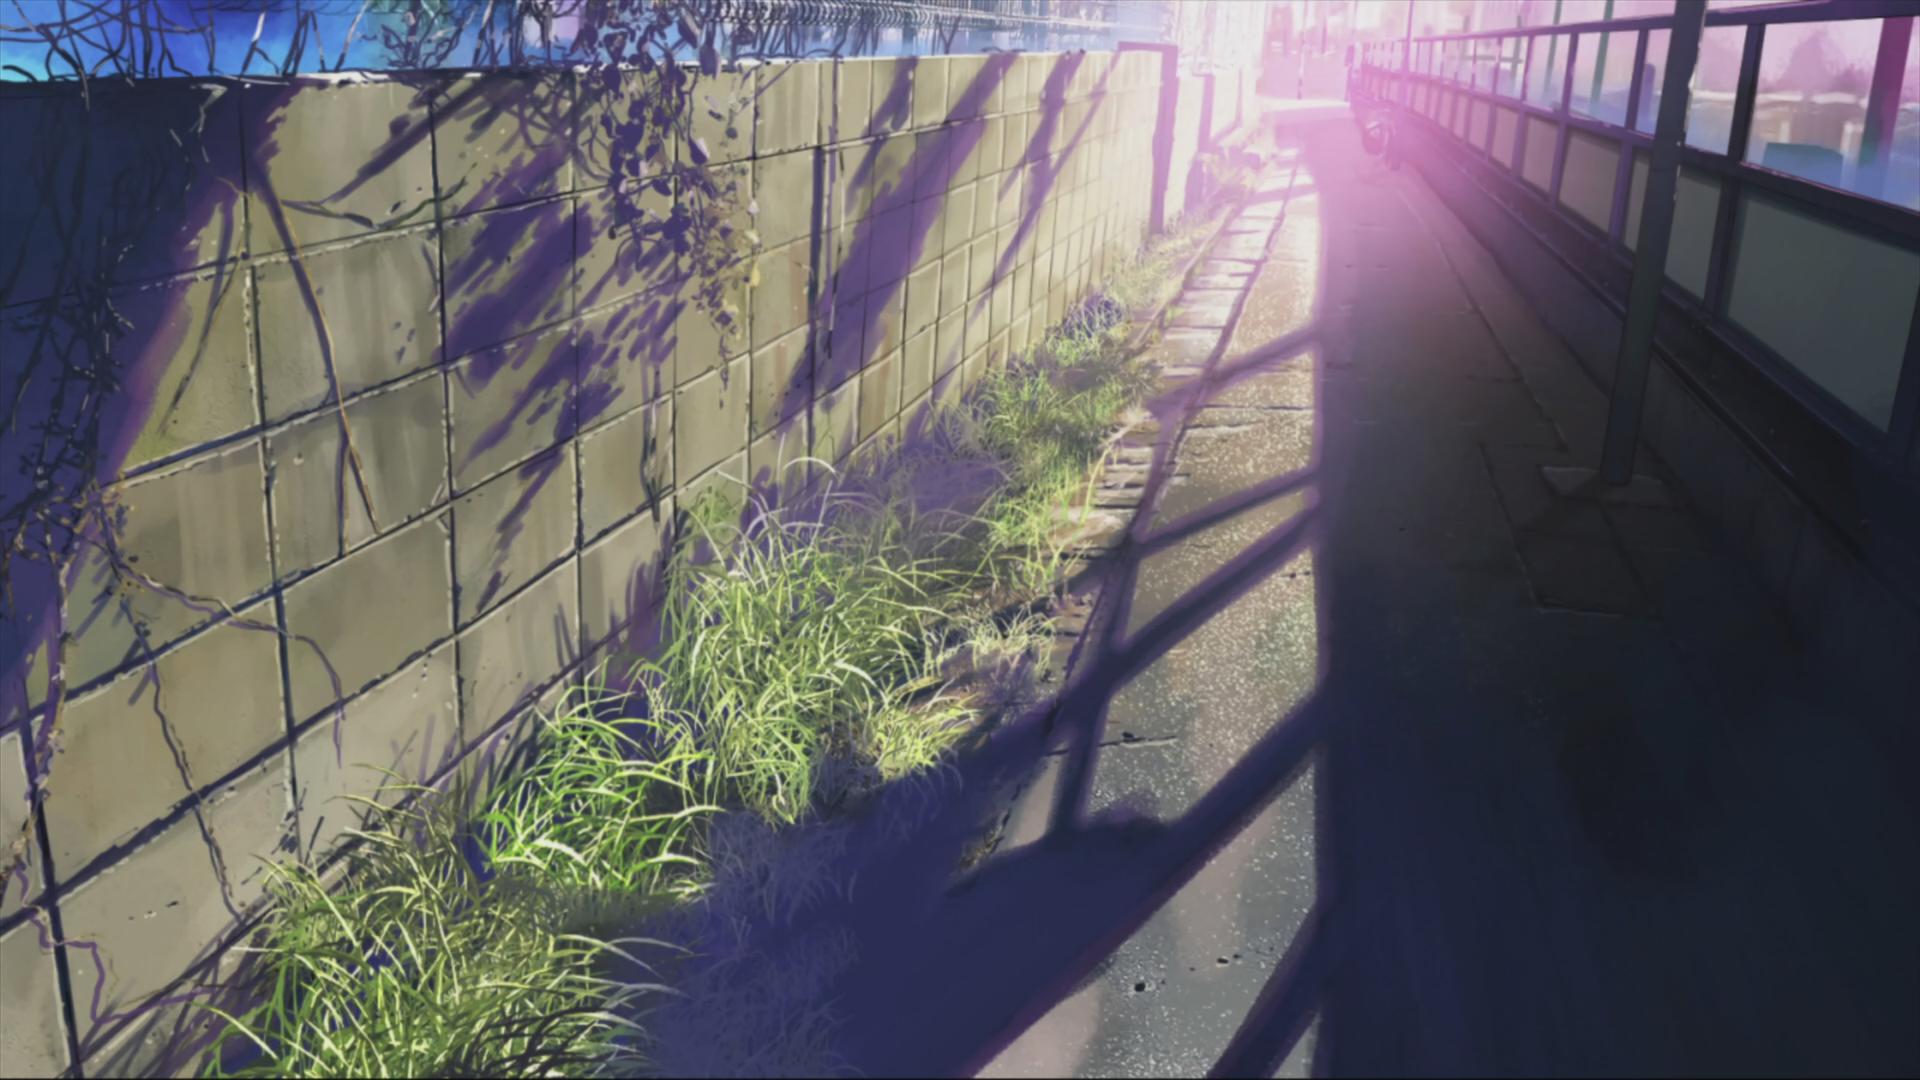 Anime 5 Centimeters Per Second Anime Wallpaper Anime